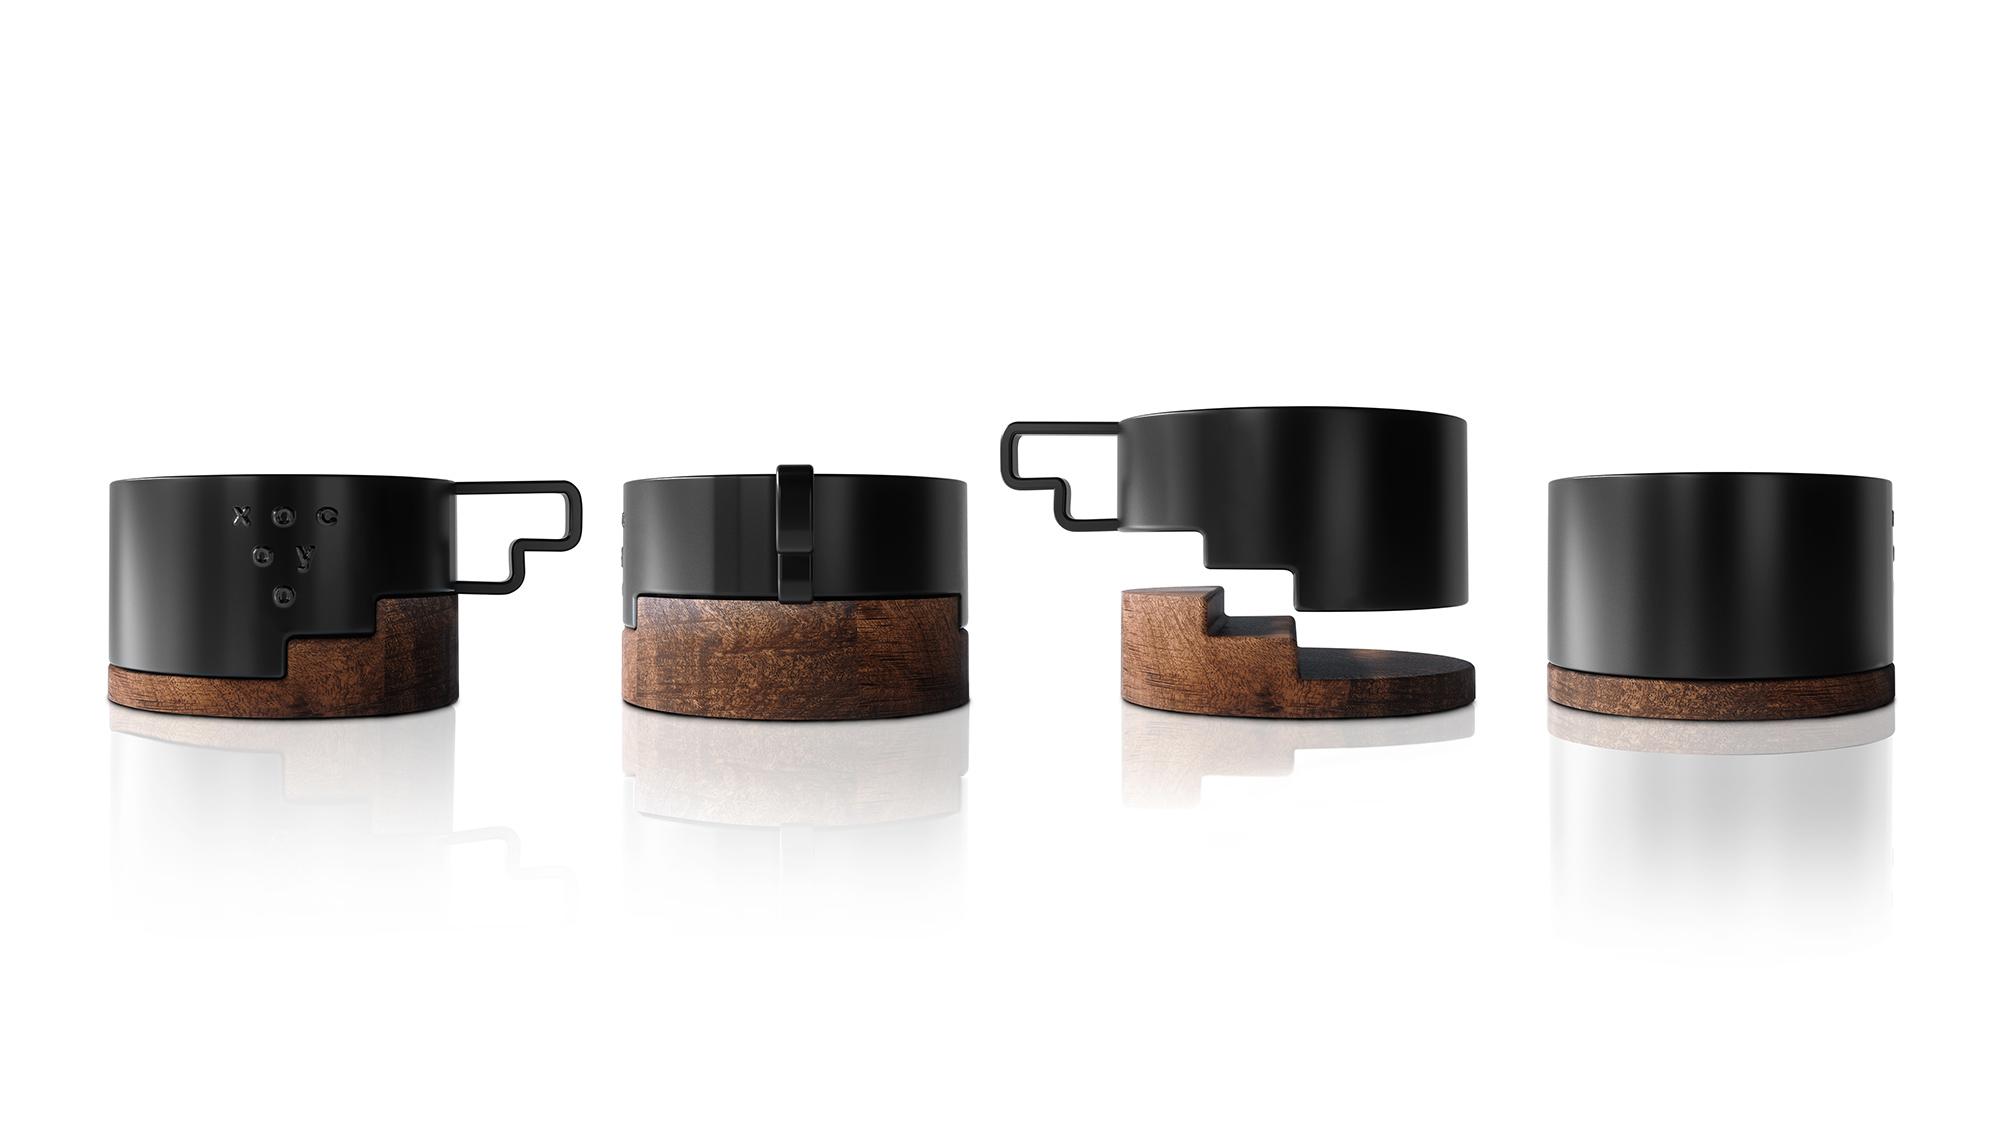 Luminous Design Group Designs Cup for Xocoyo